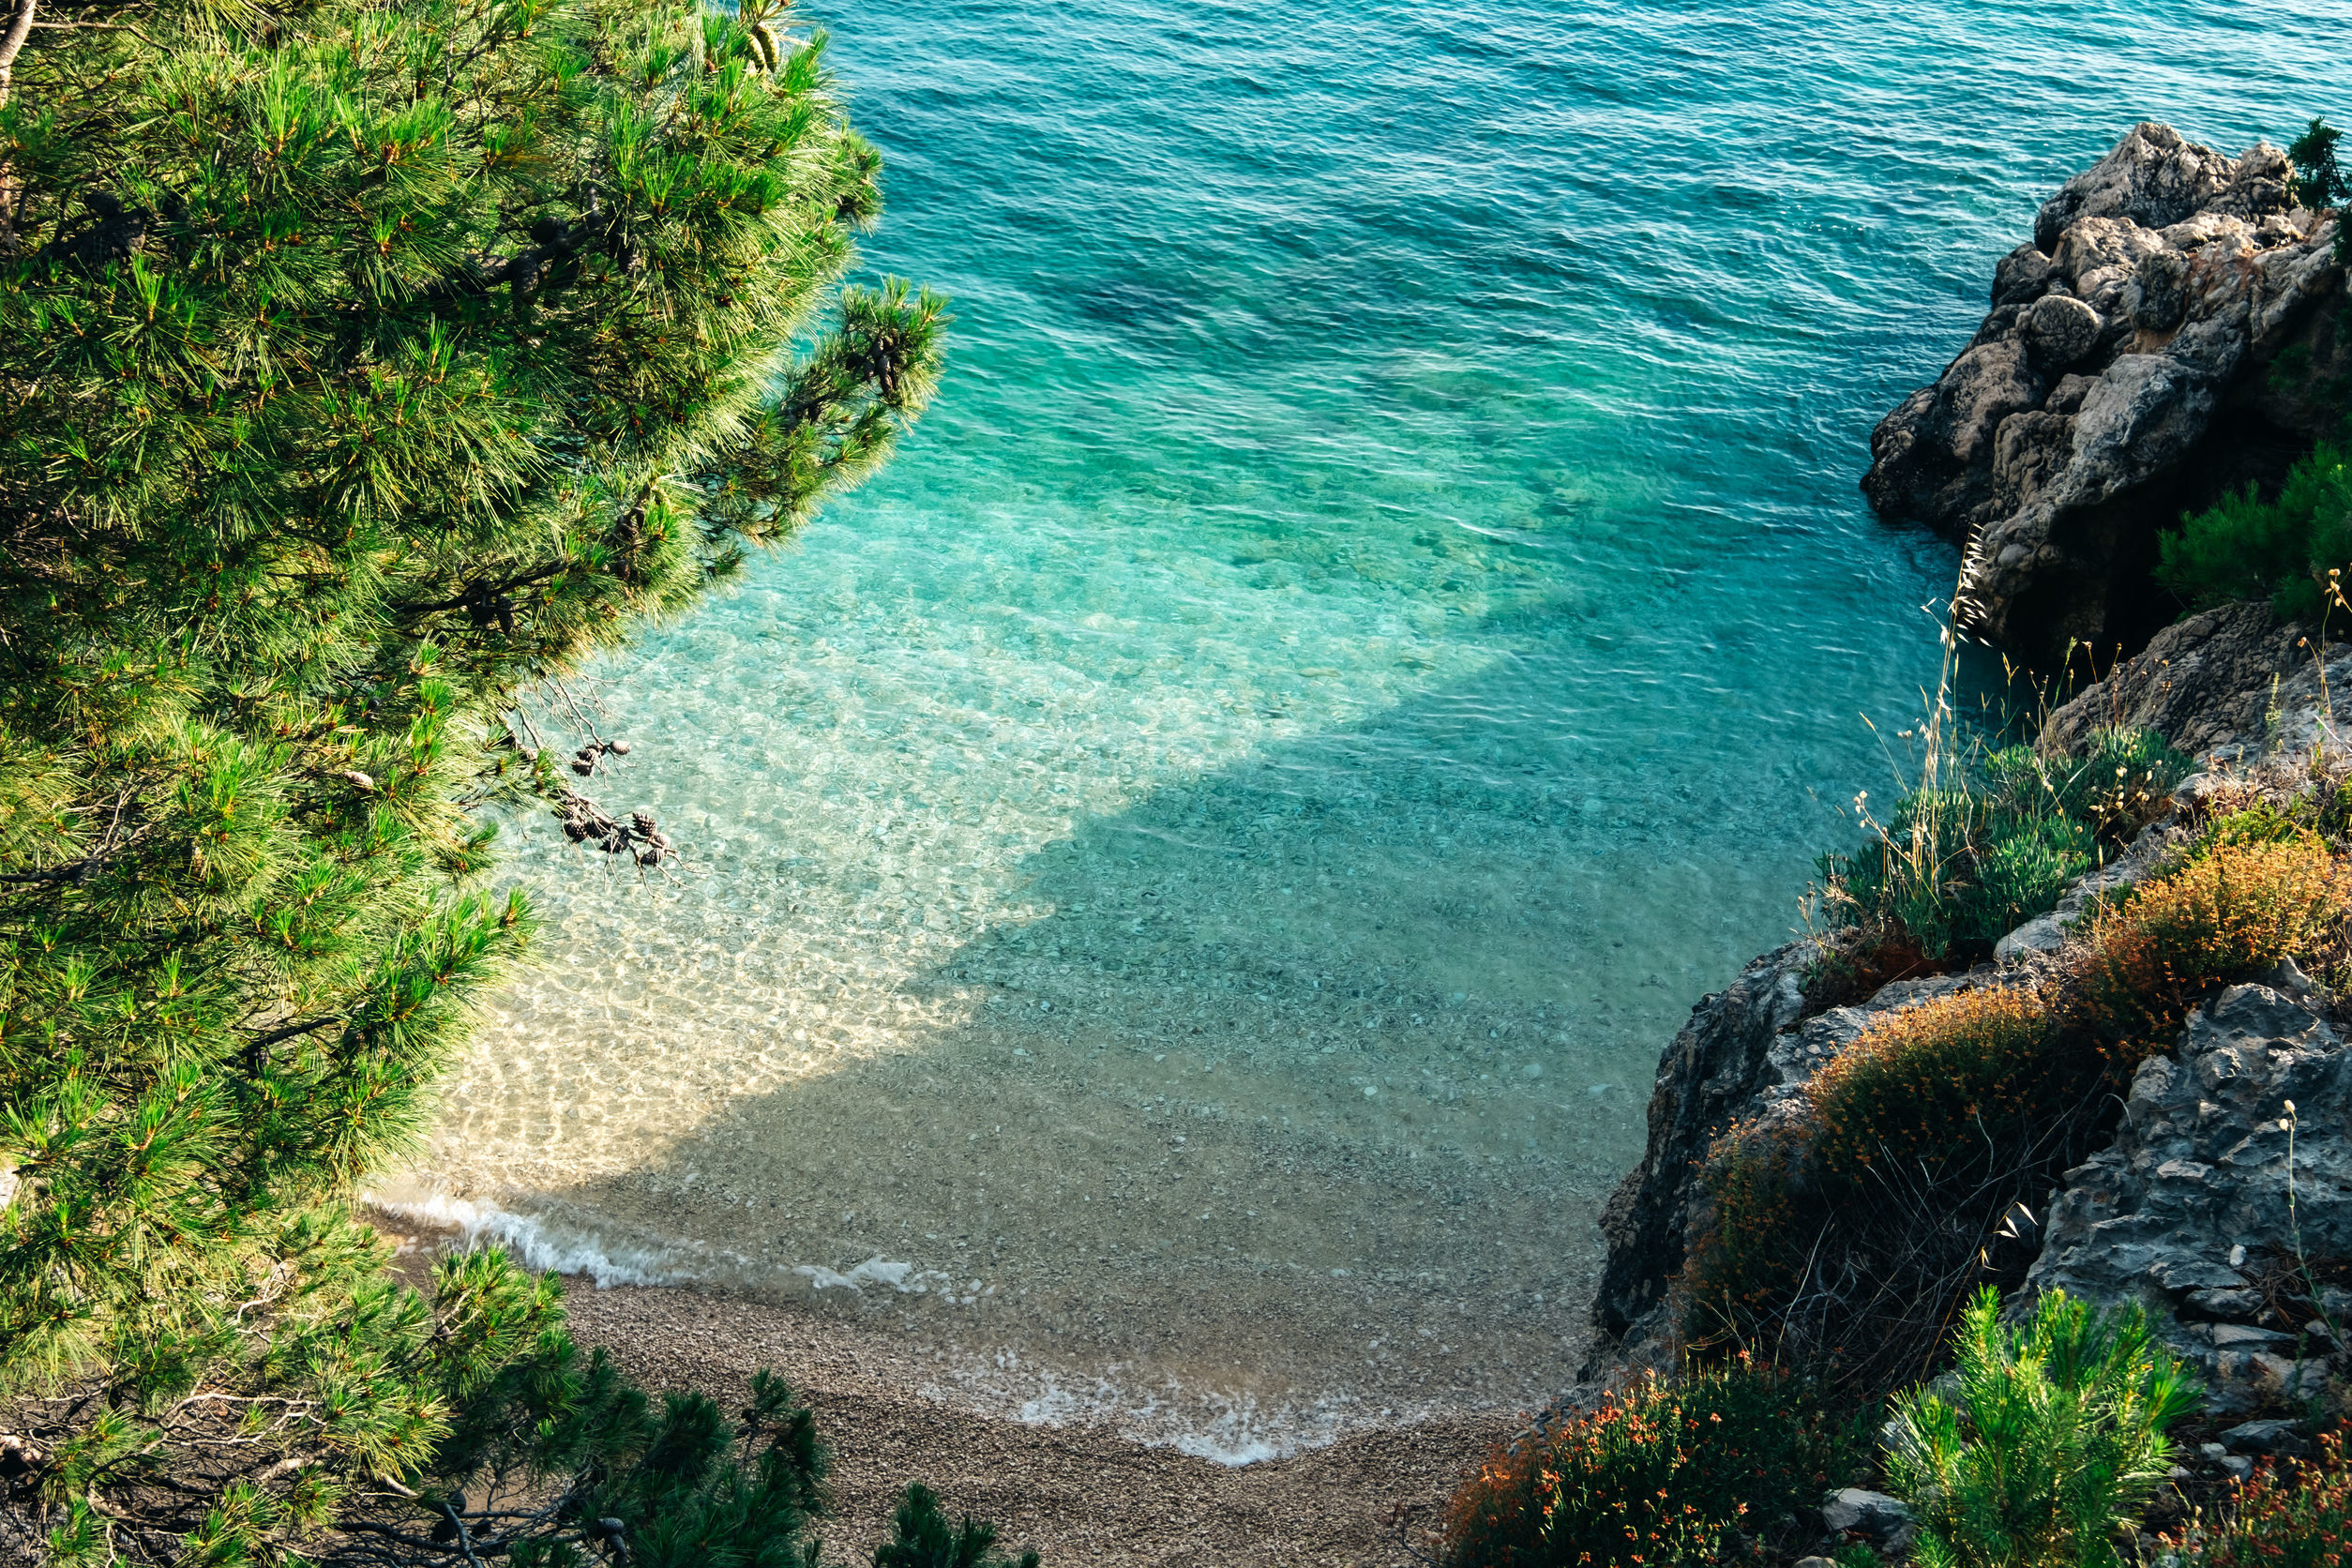 Bay near Podgora, Croatia Makarska riviera